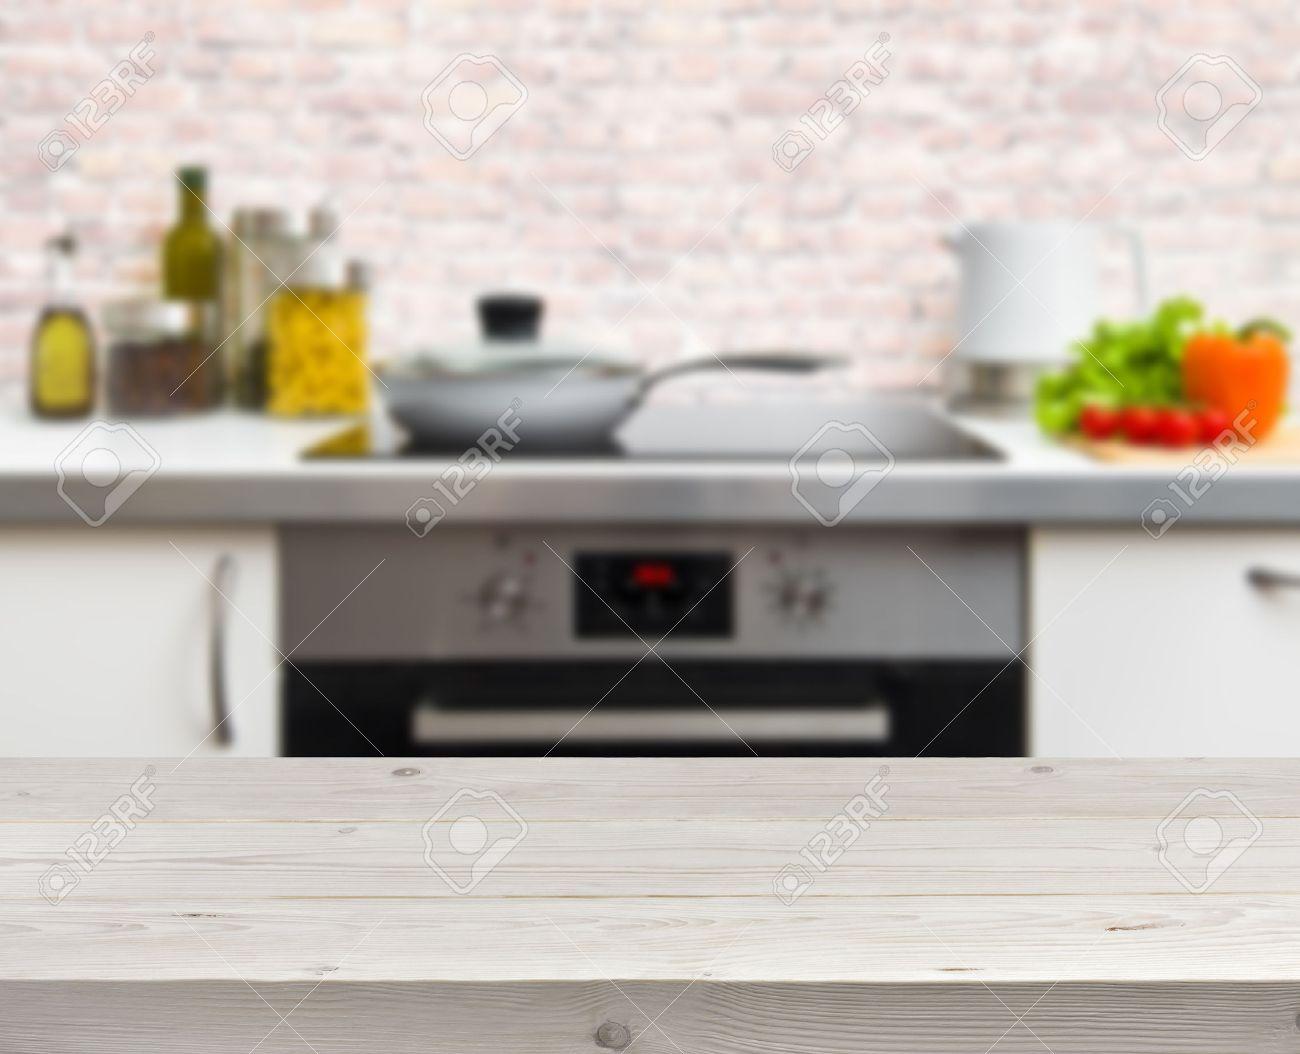 Mesa de madera sobre fondo desenfocado rústica cocina